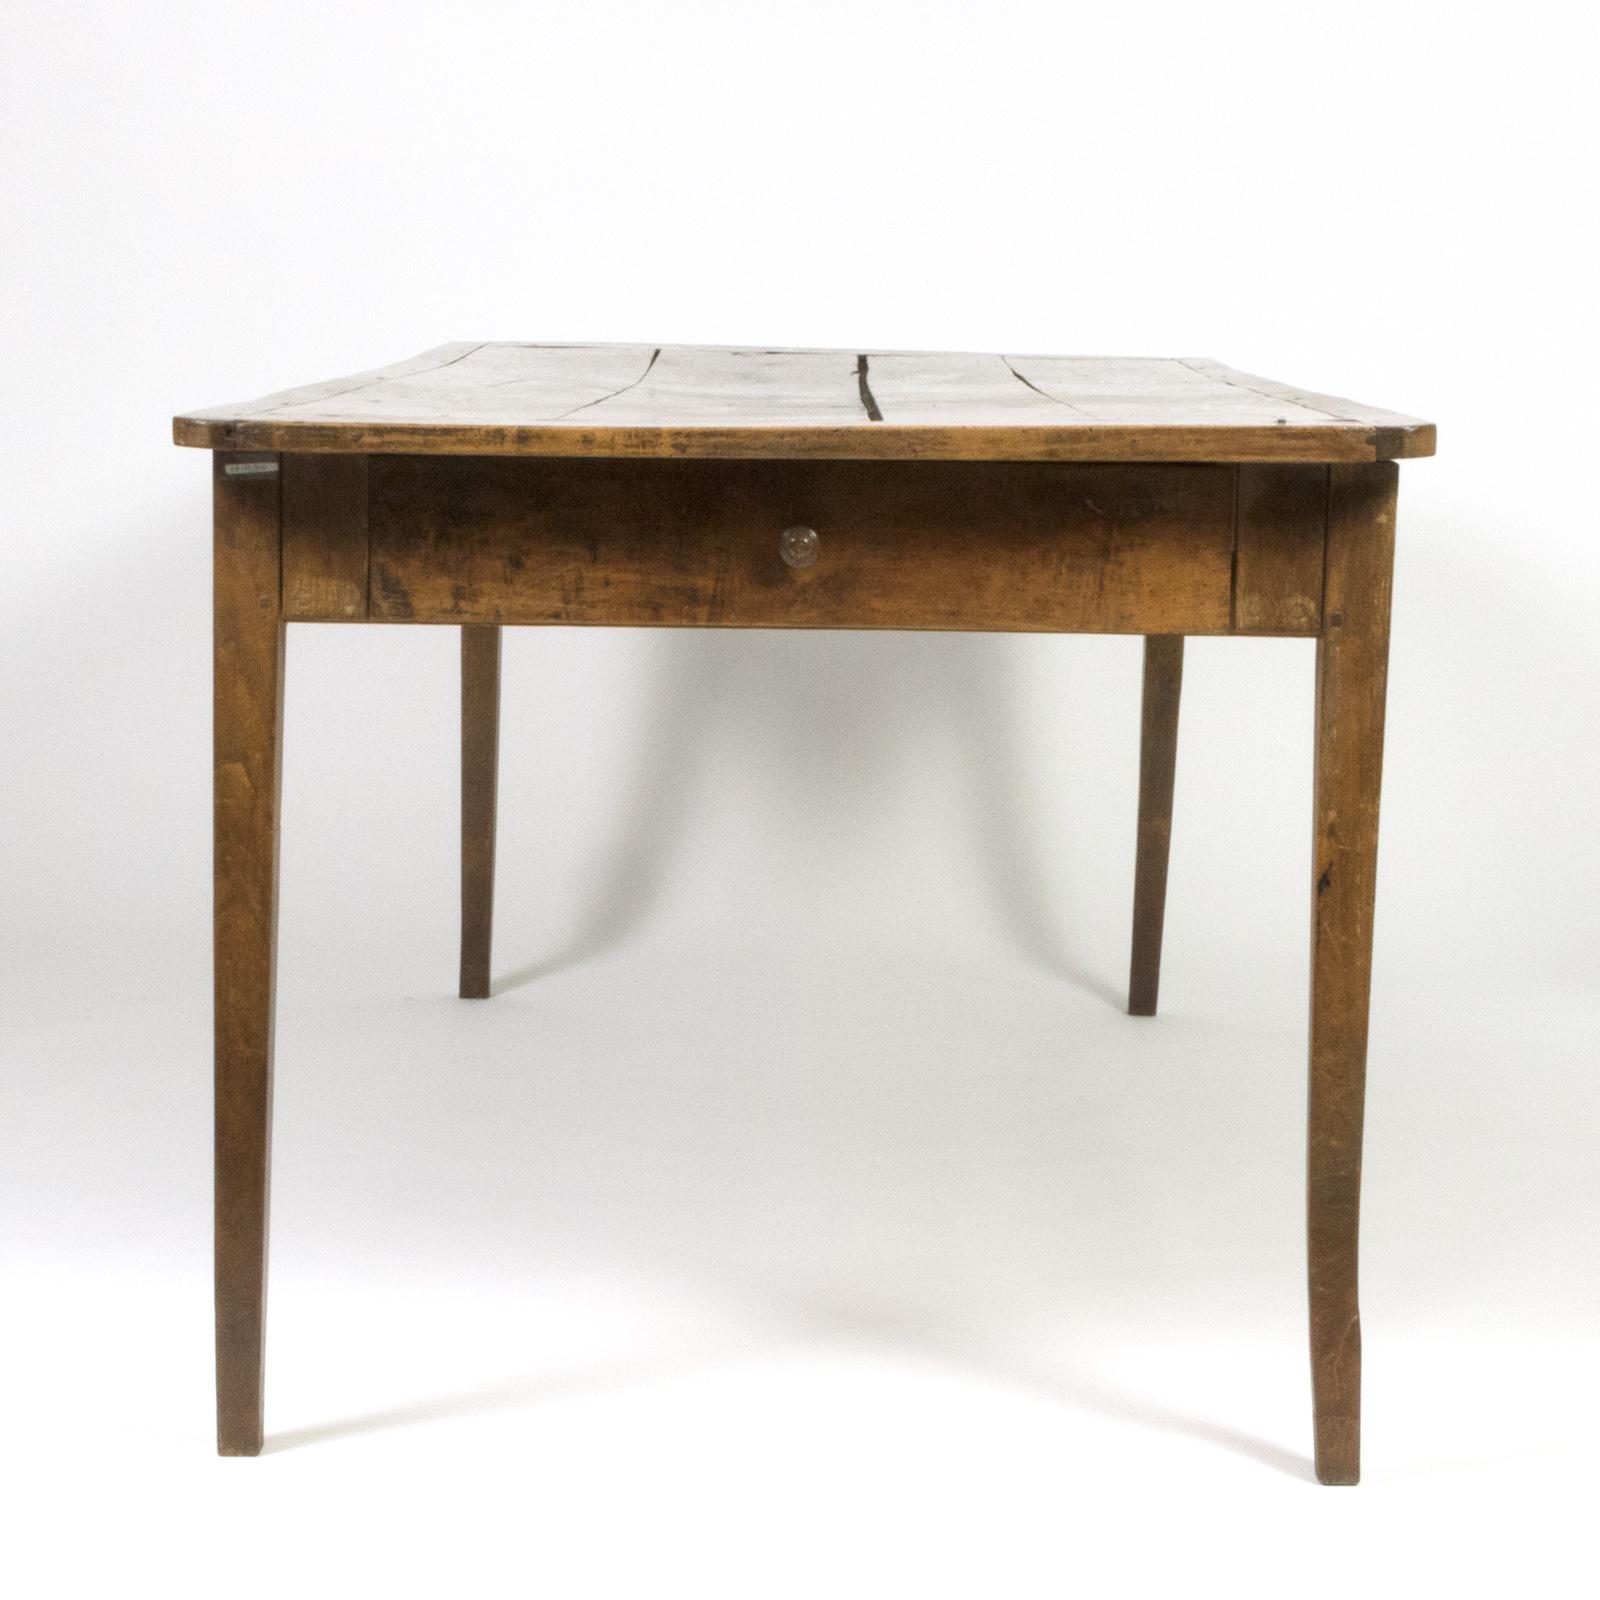 Garden Court Antiques, San Francisco   Very Rare Elm Farm Table With  Incredible Patina U0026